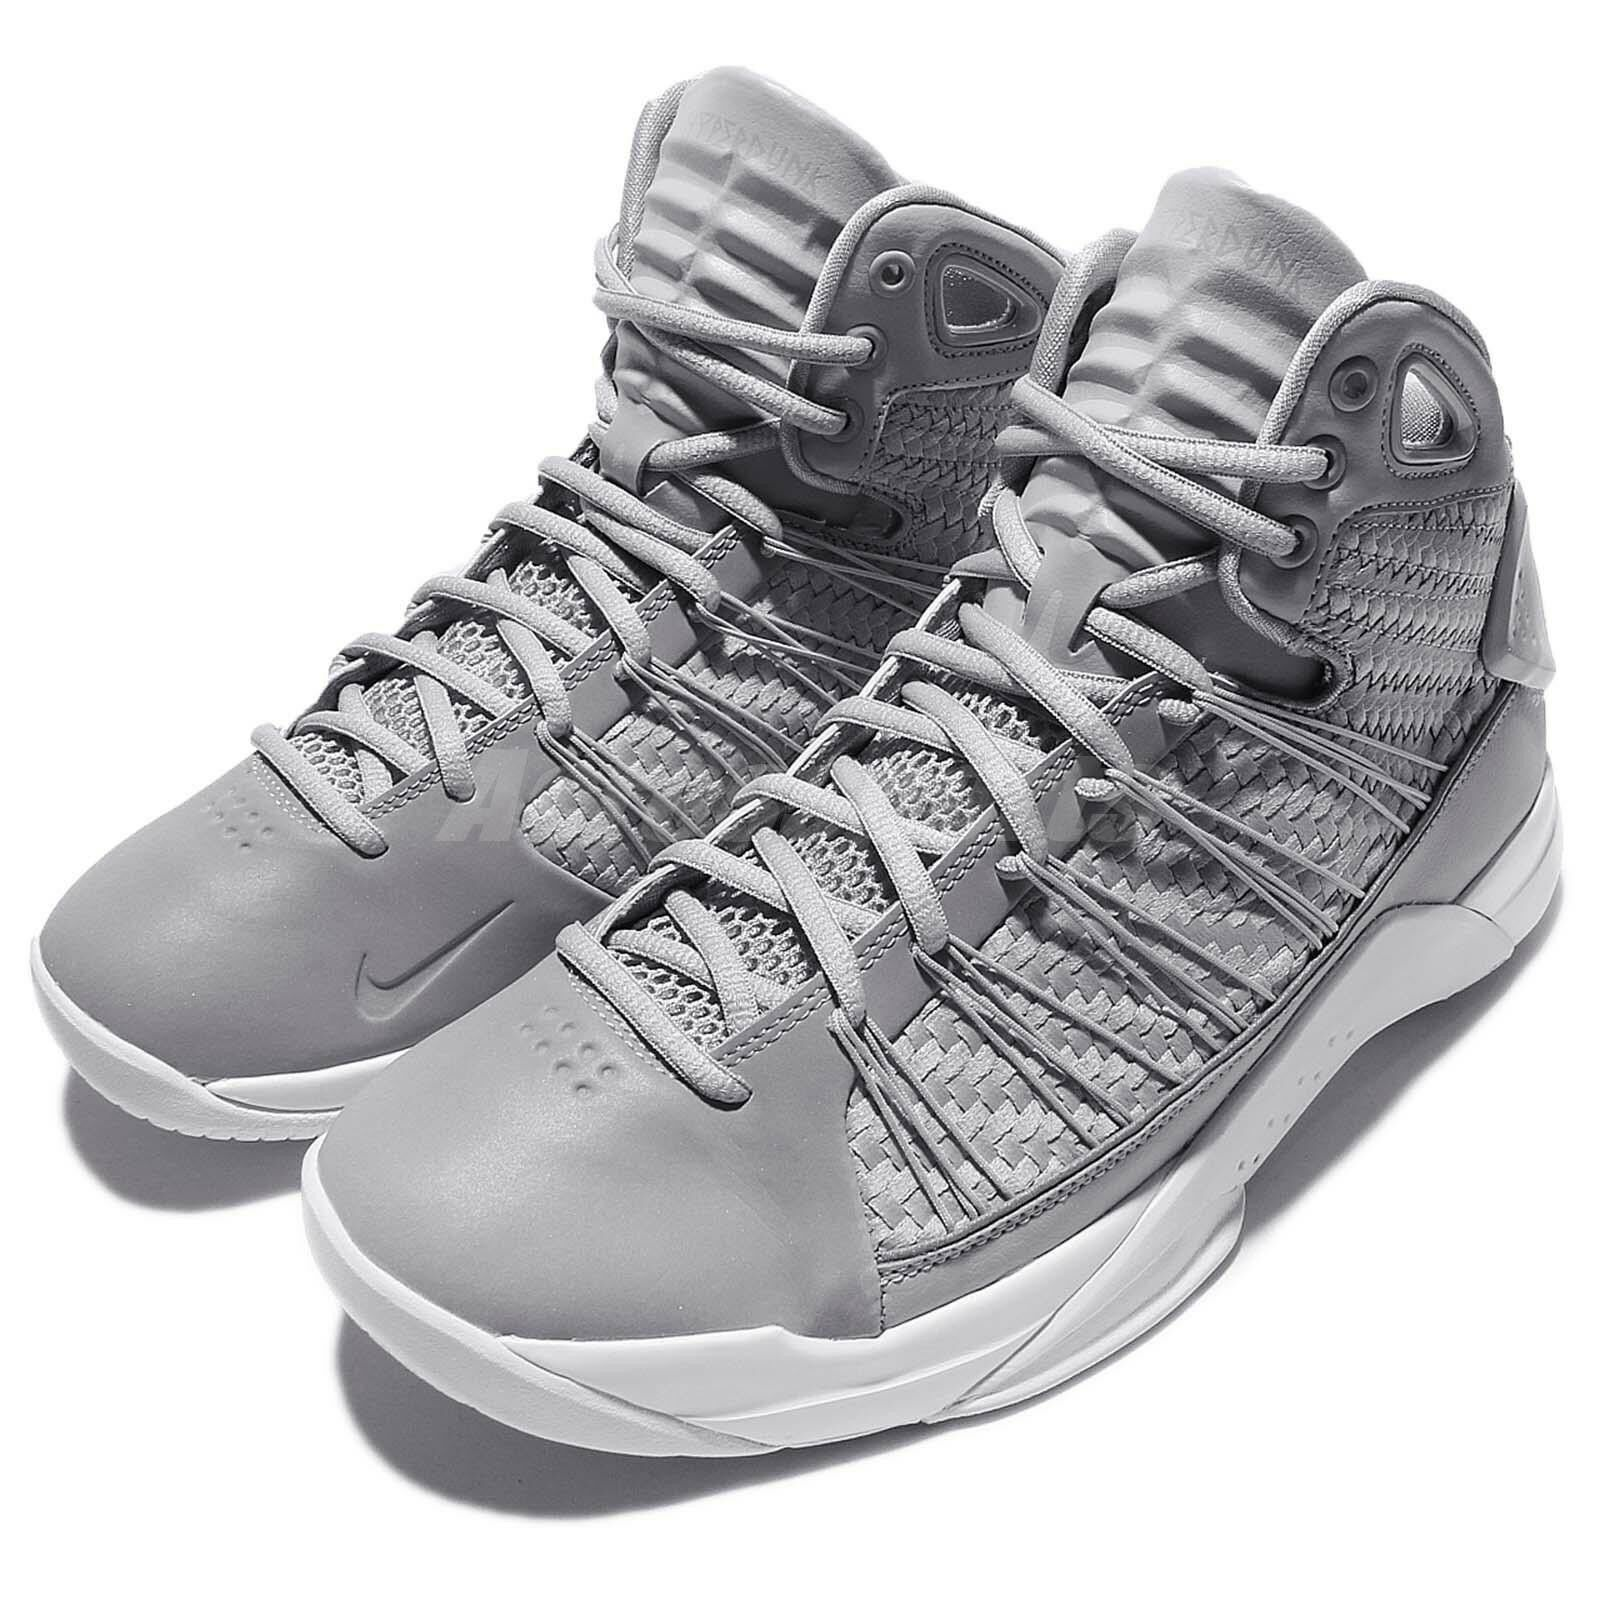 Nike Hyperdunk LUX men basketball lifestyle shoes 2018 08 NEW grey 818137-002